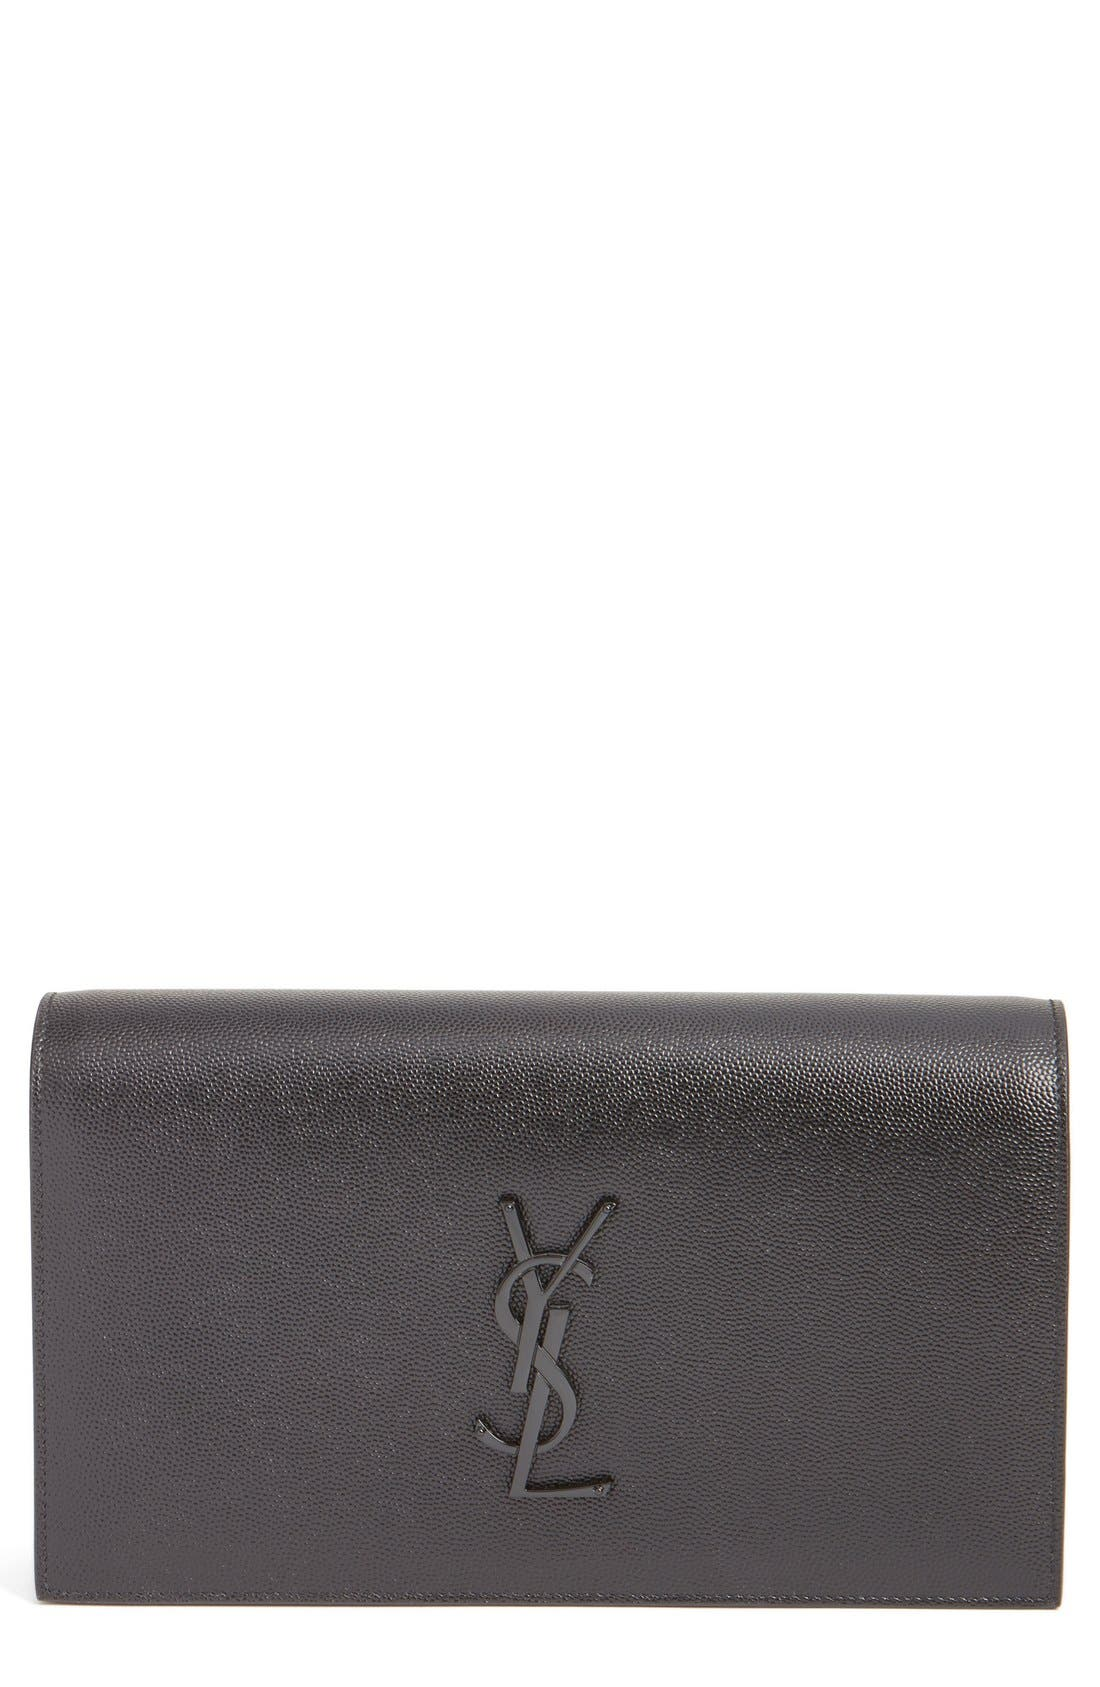 Main Image - Saint Laurent 'Kate' Pebbled Calfskin Leather Clutch